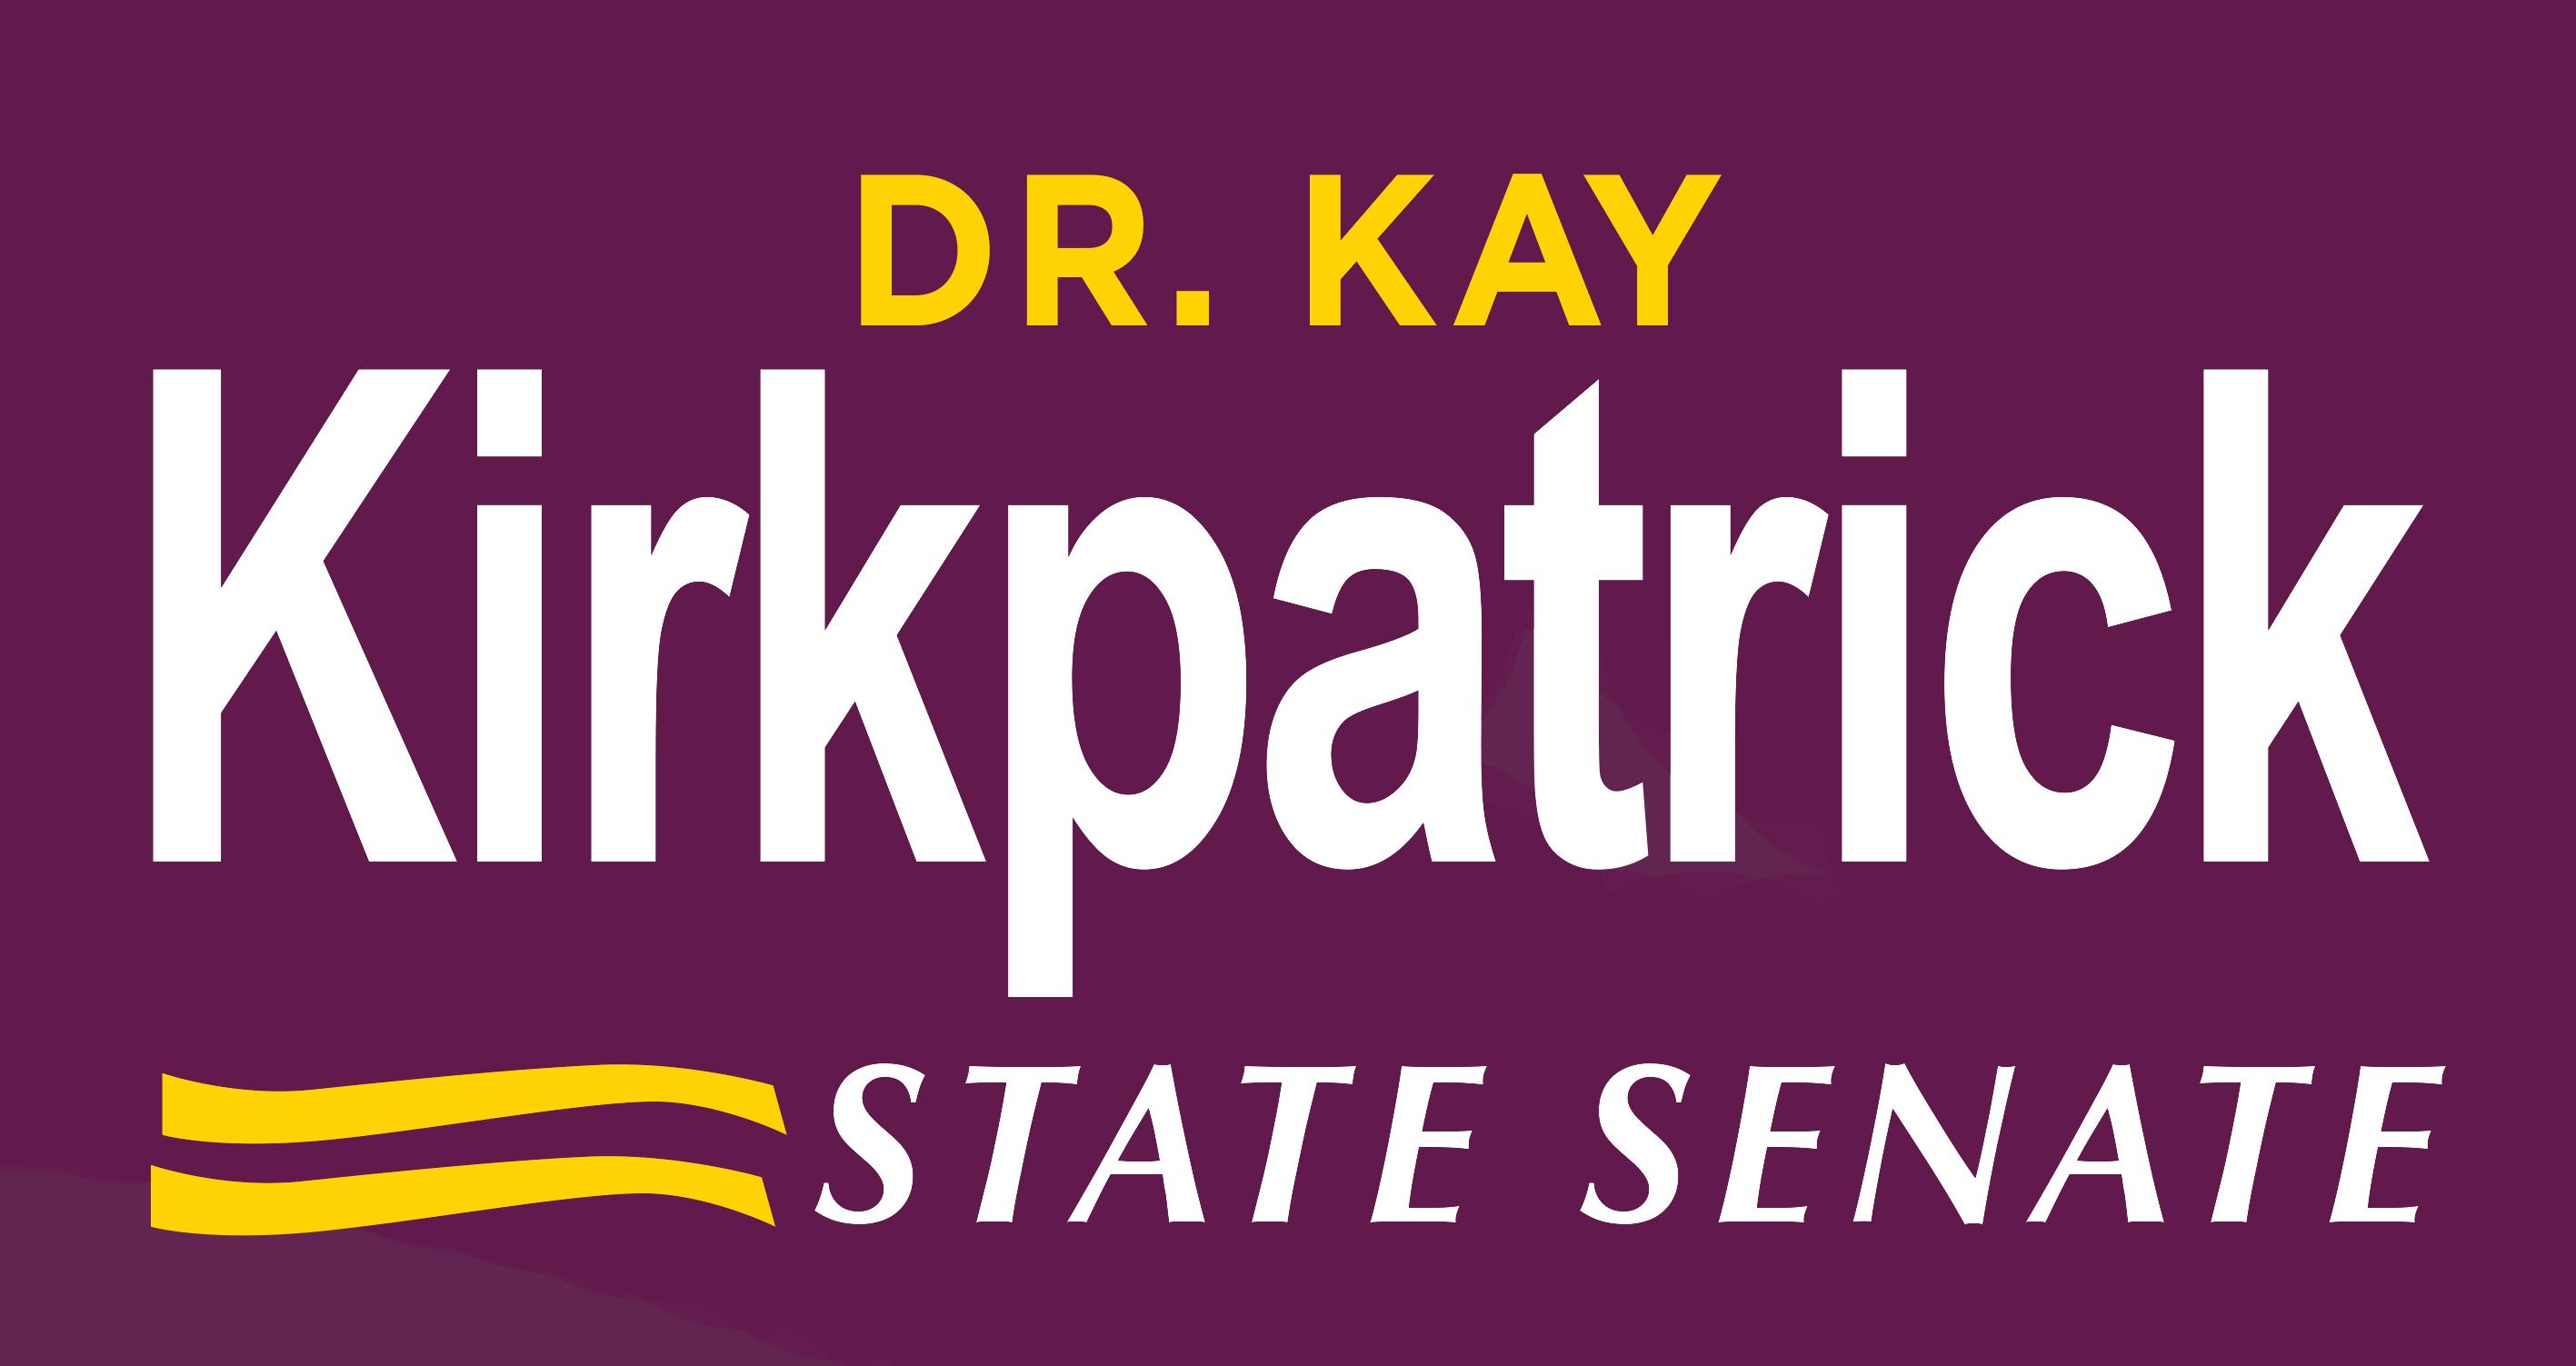 Senator Kay Kirkpatrick